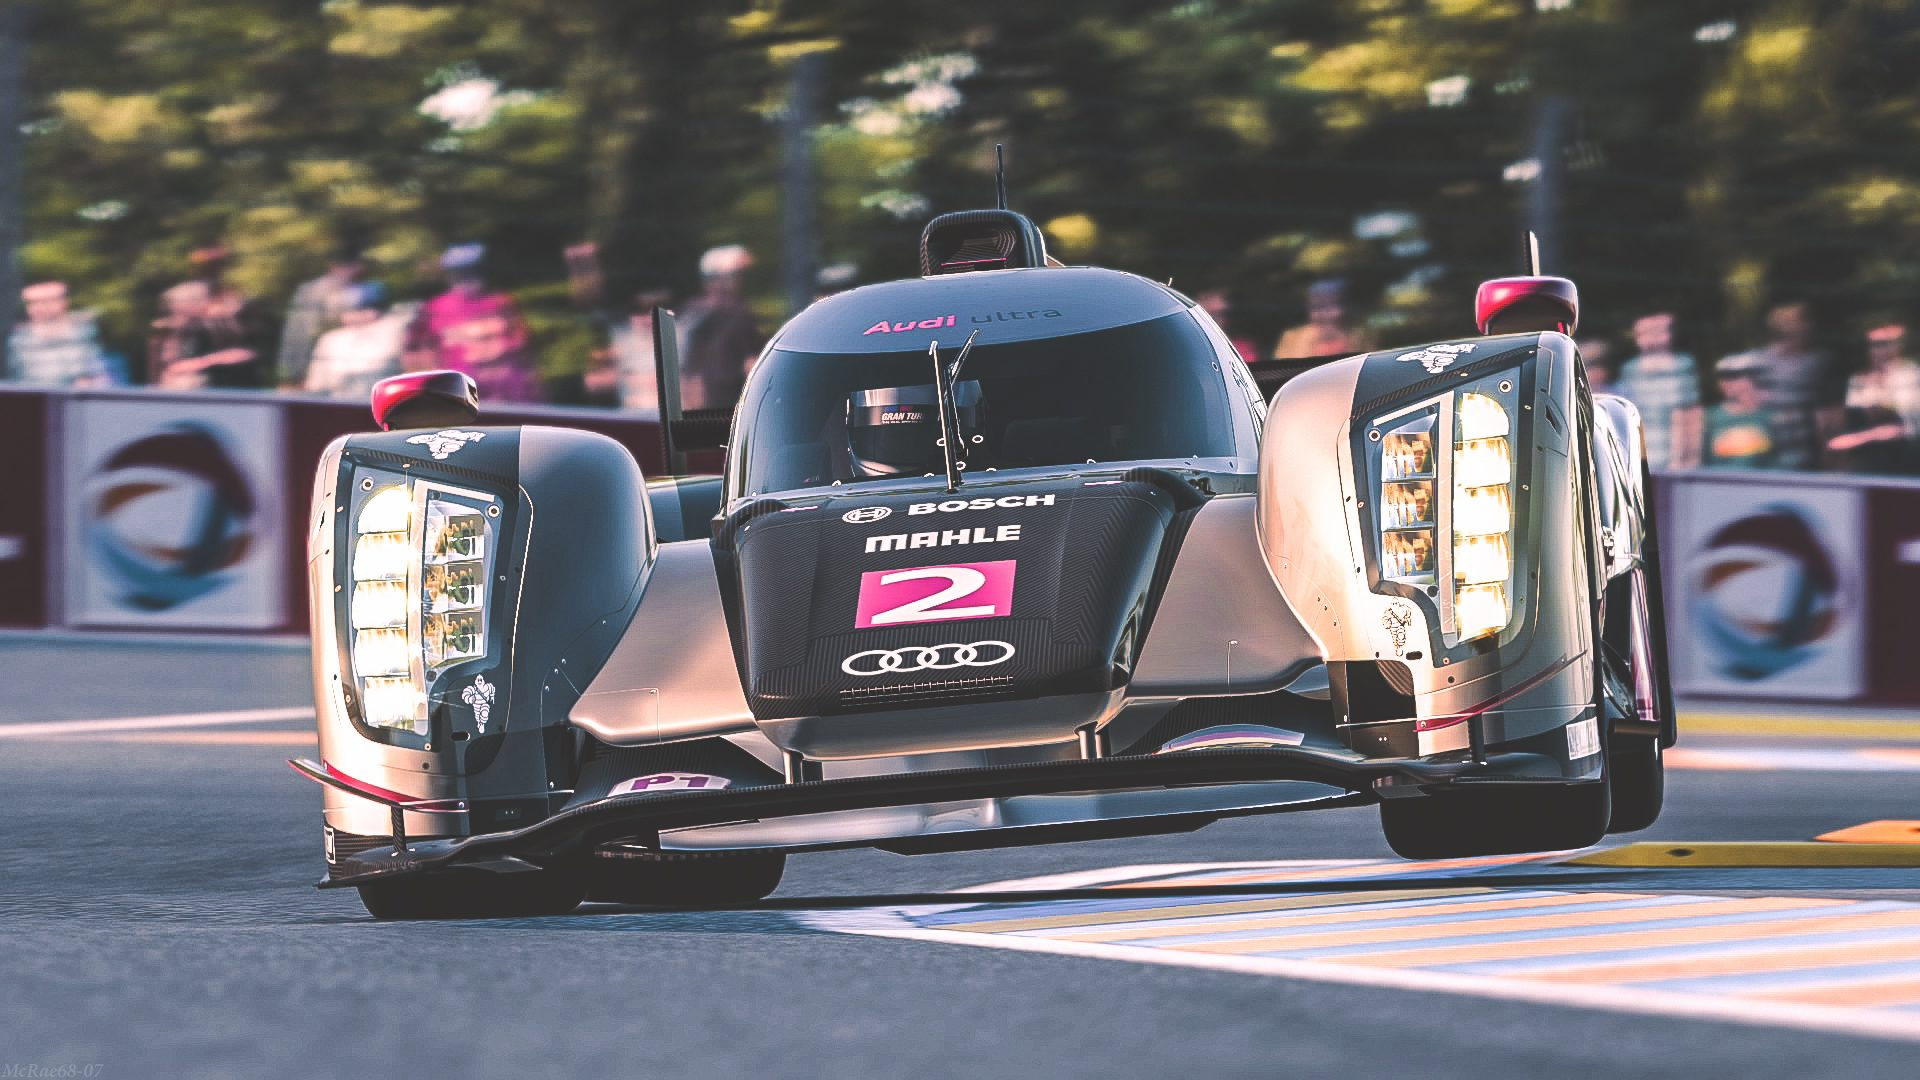 Circuit de la Sarthe 2013 leman24 6.jpg